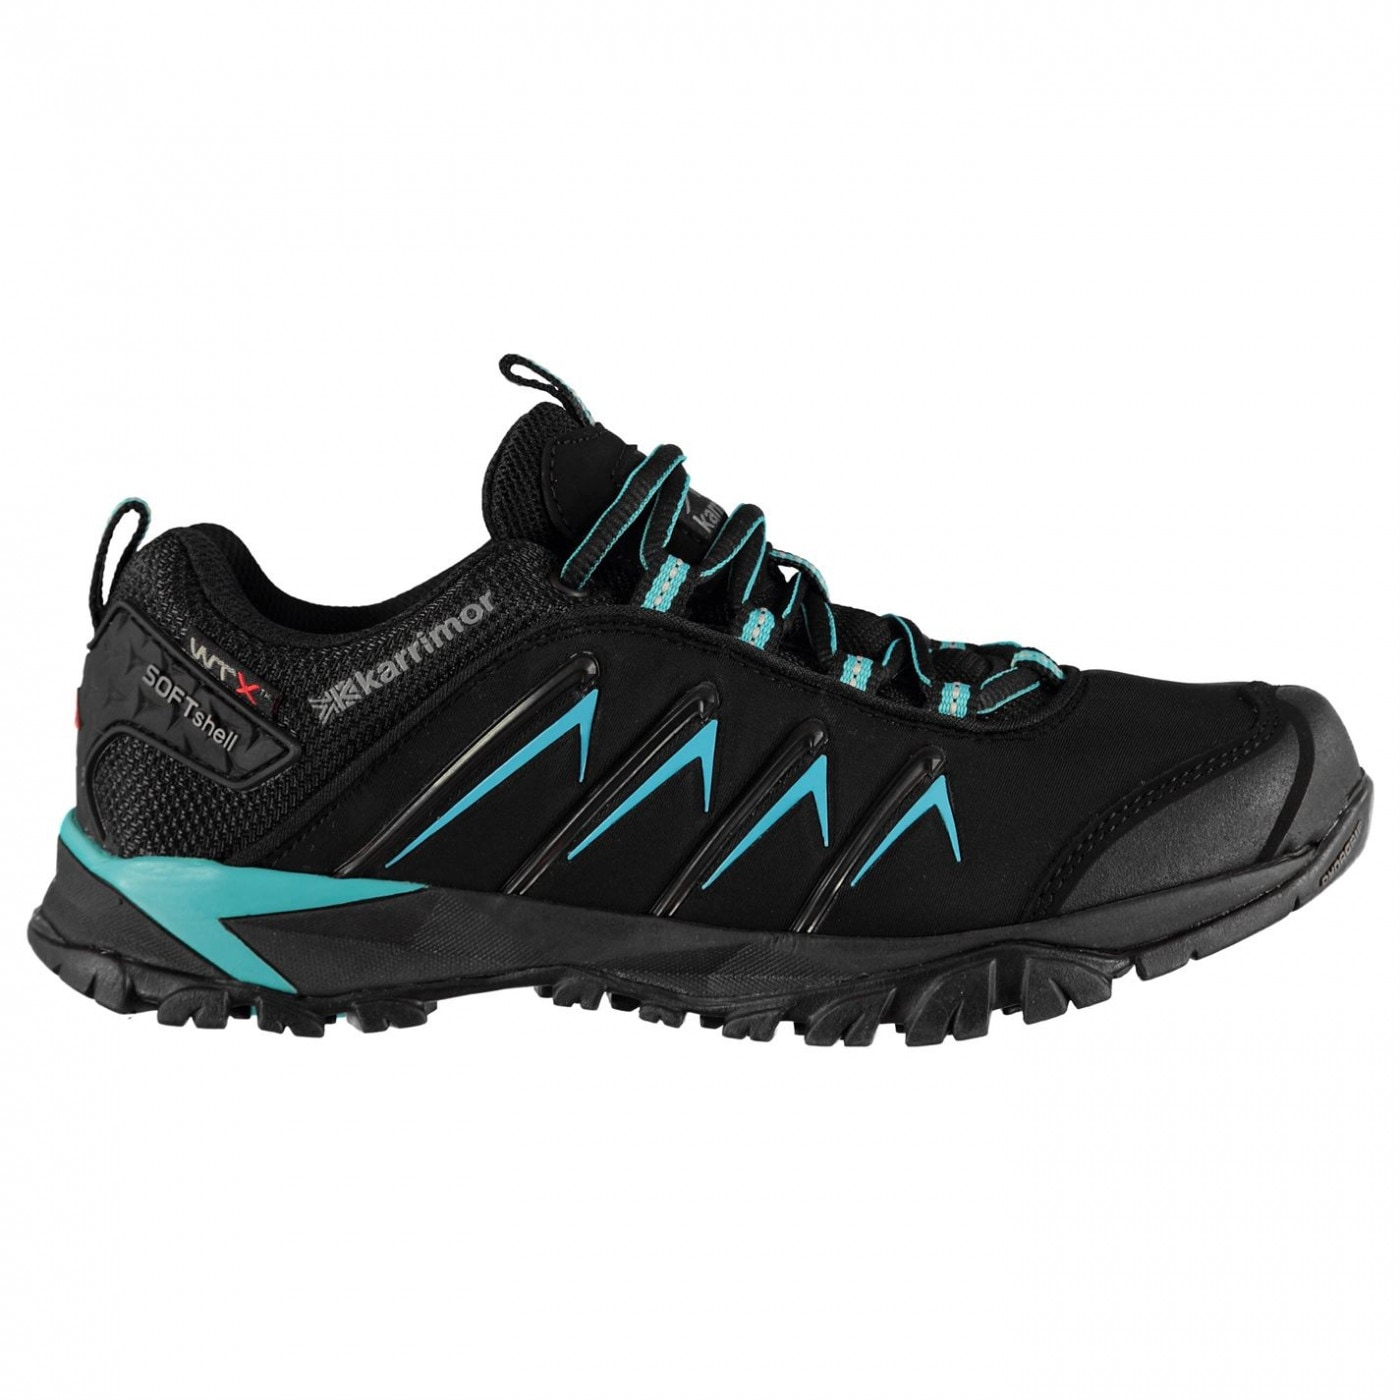 Karrimor Surge Soft Shell WTX Ladies Walking Shoes